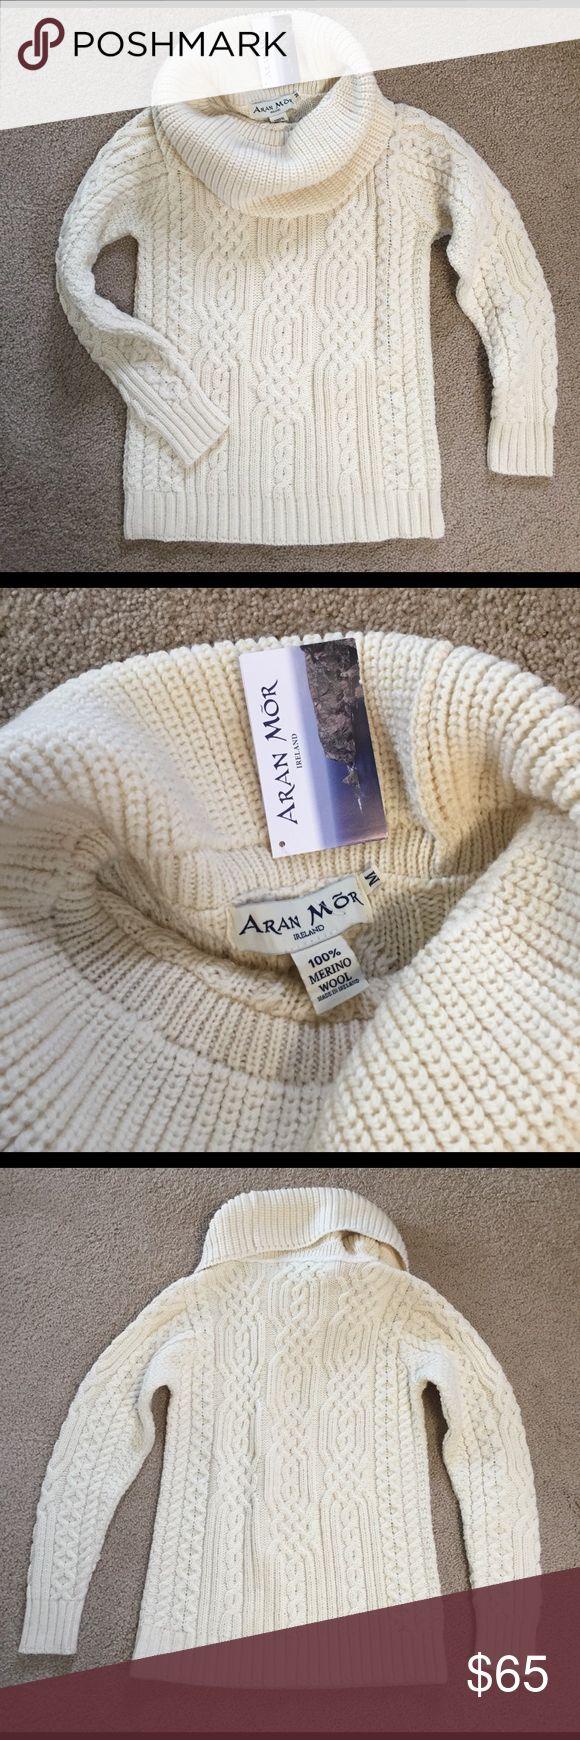 Aran Irish Sweater Aran Irish cowl neck sweater.  Great condition!  Never worn.  Comes from smoke and pet free home. Aran Mor Sweaters